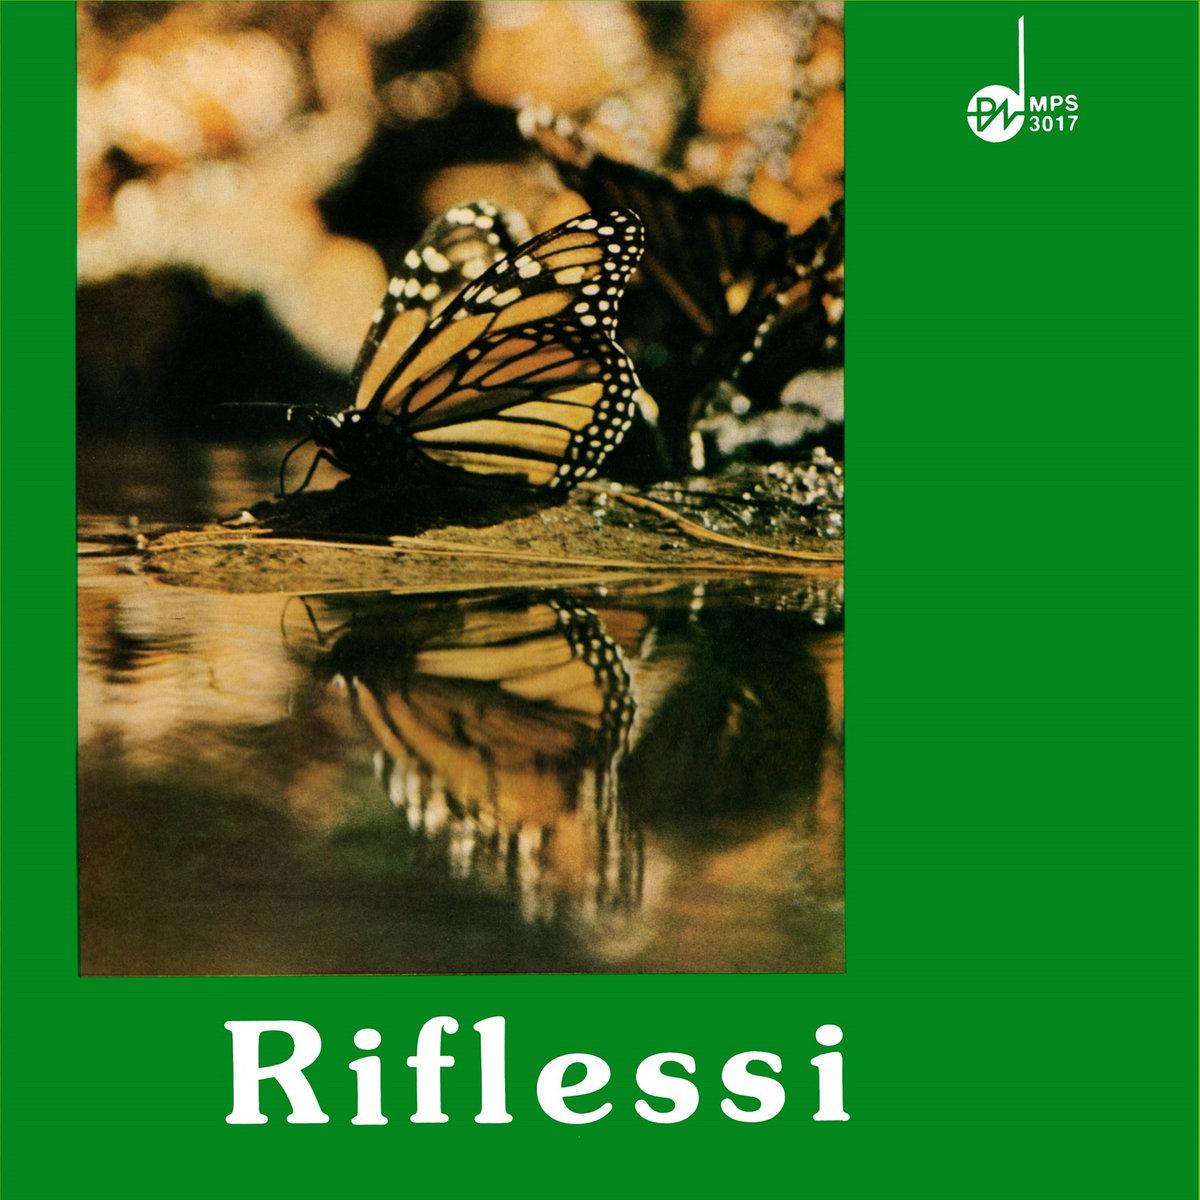 RIFLESSI